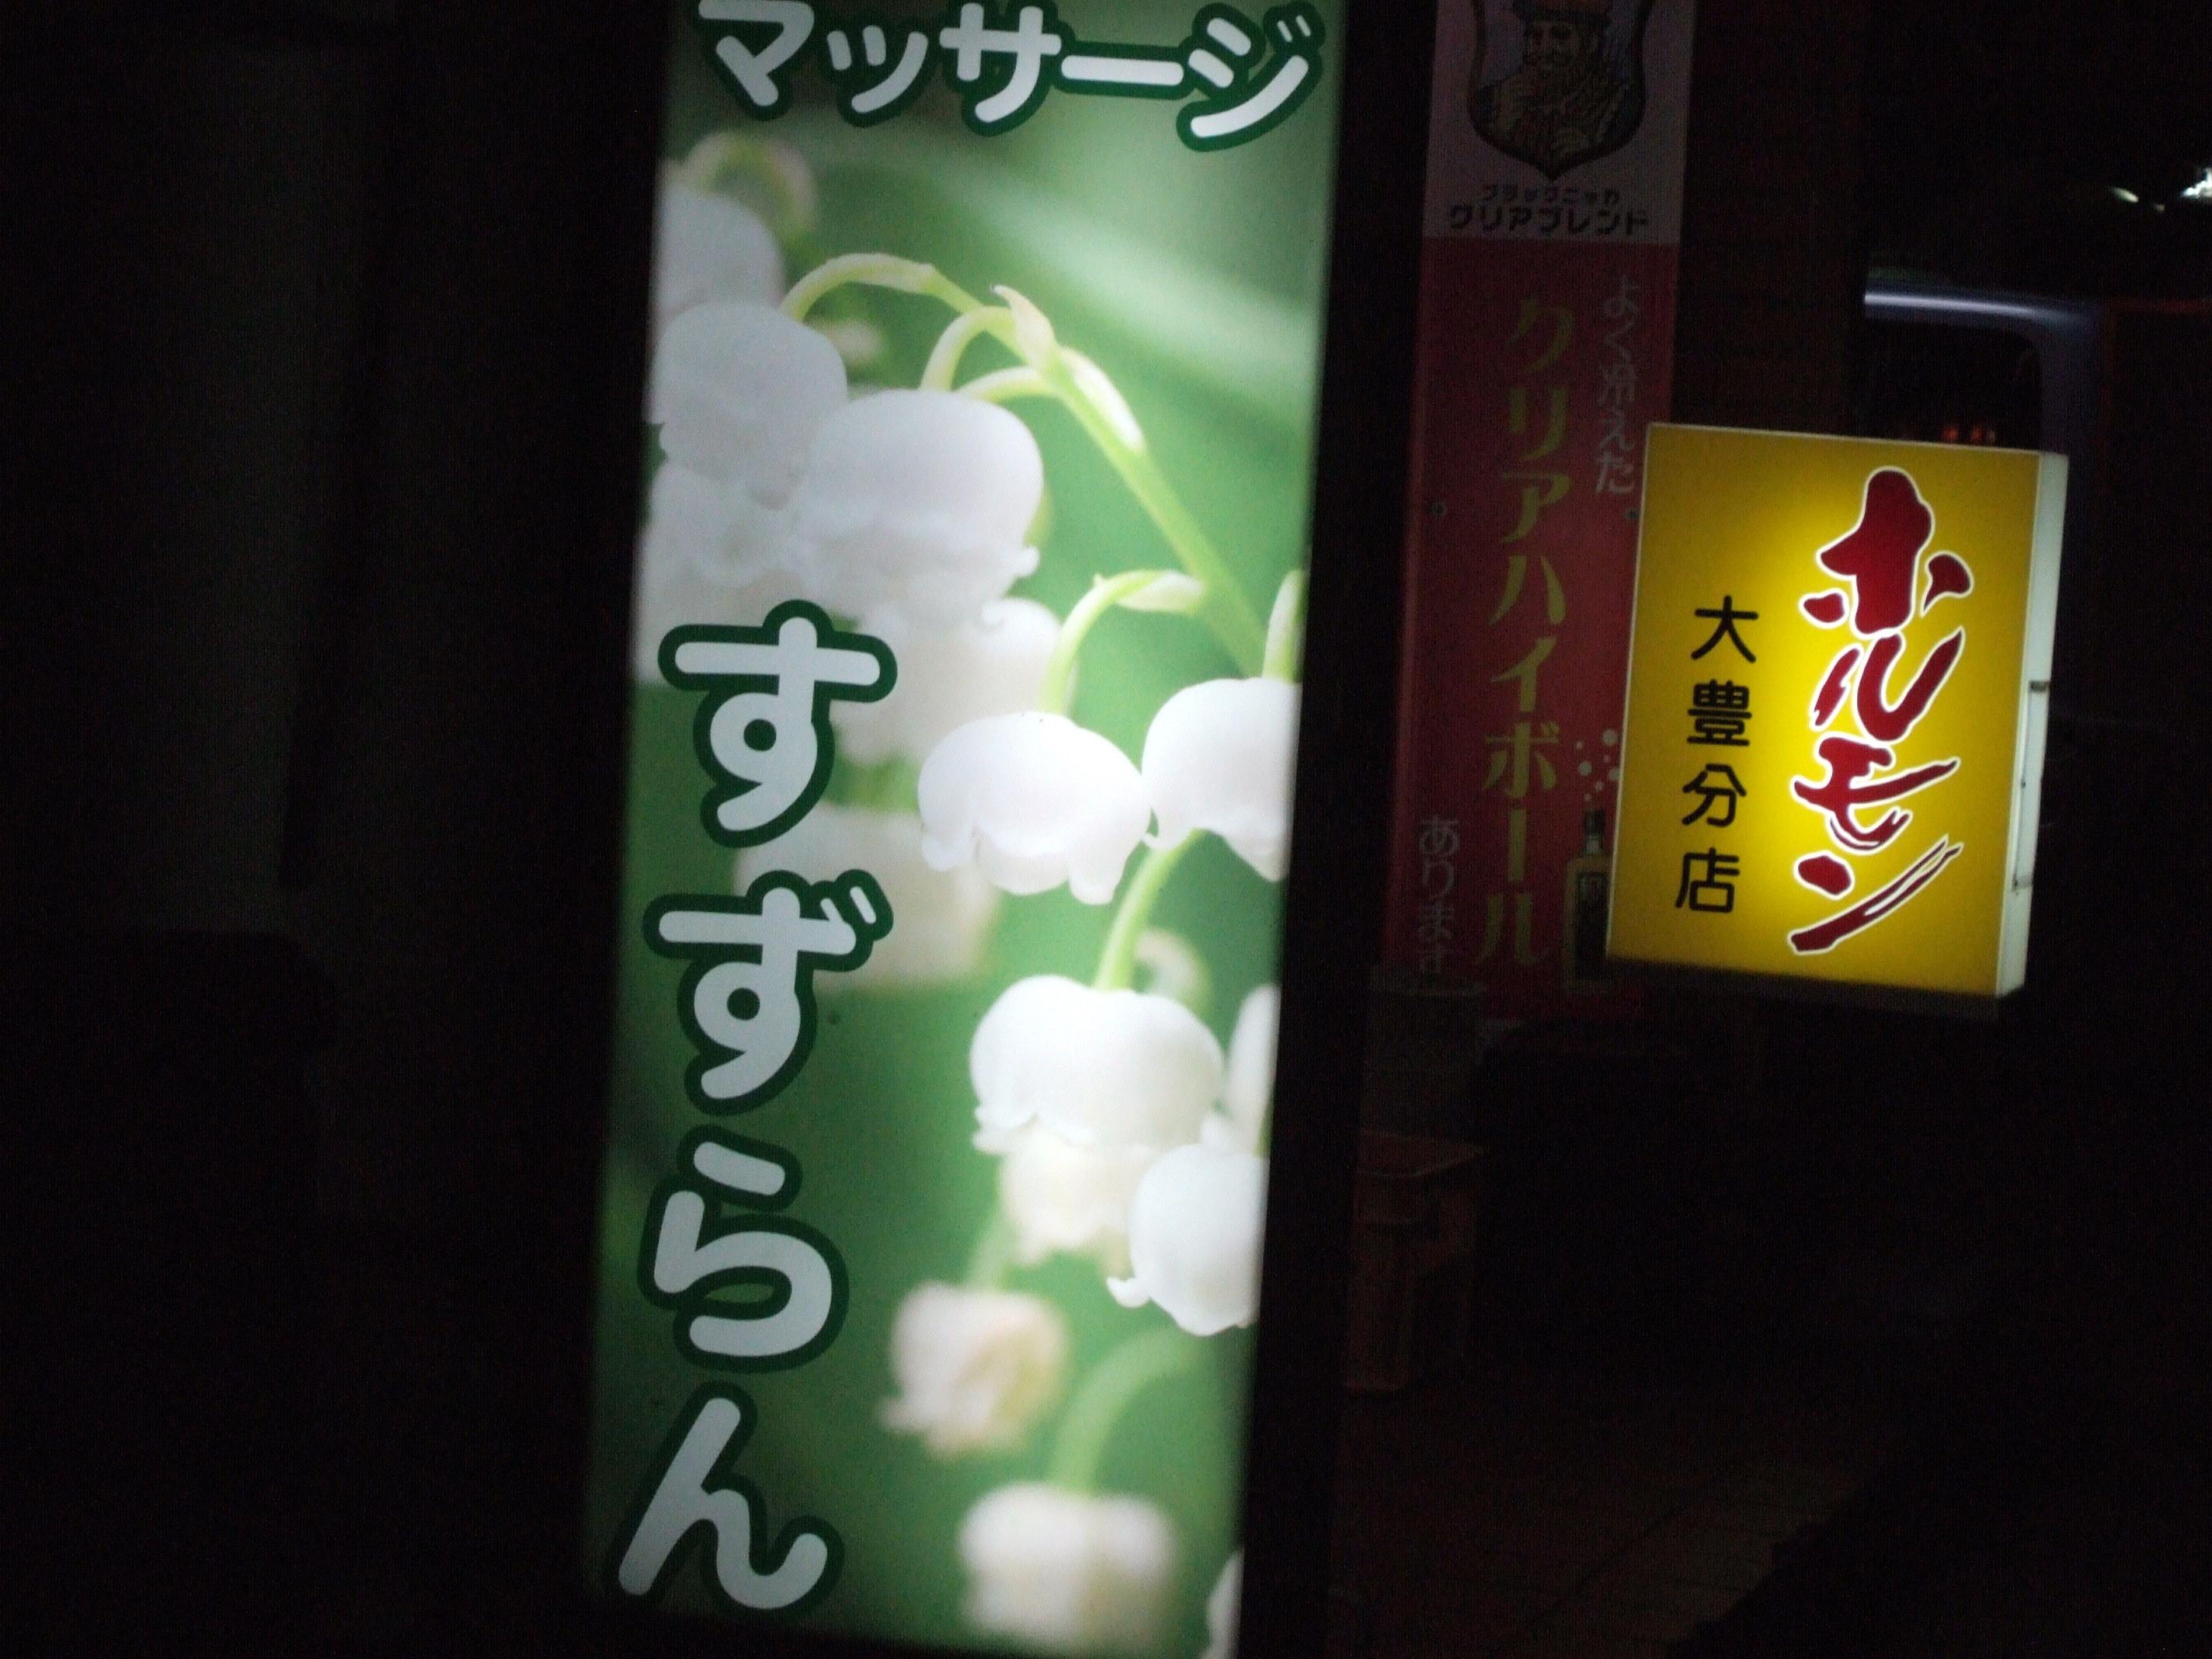 koriyama_suzuran03.jpg